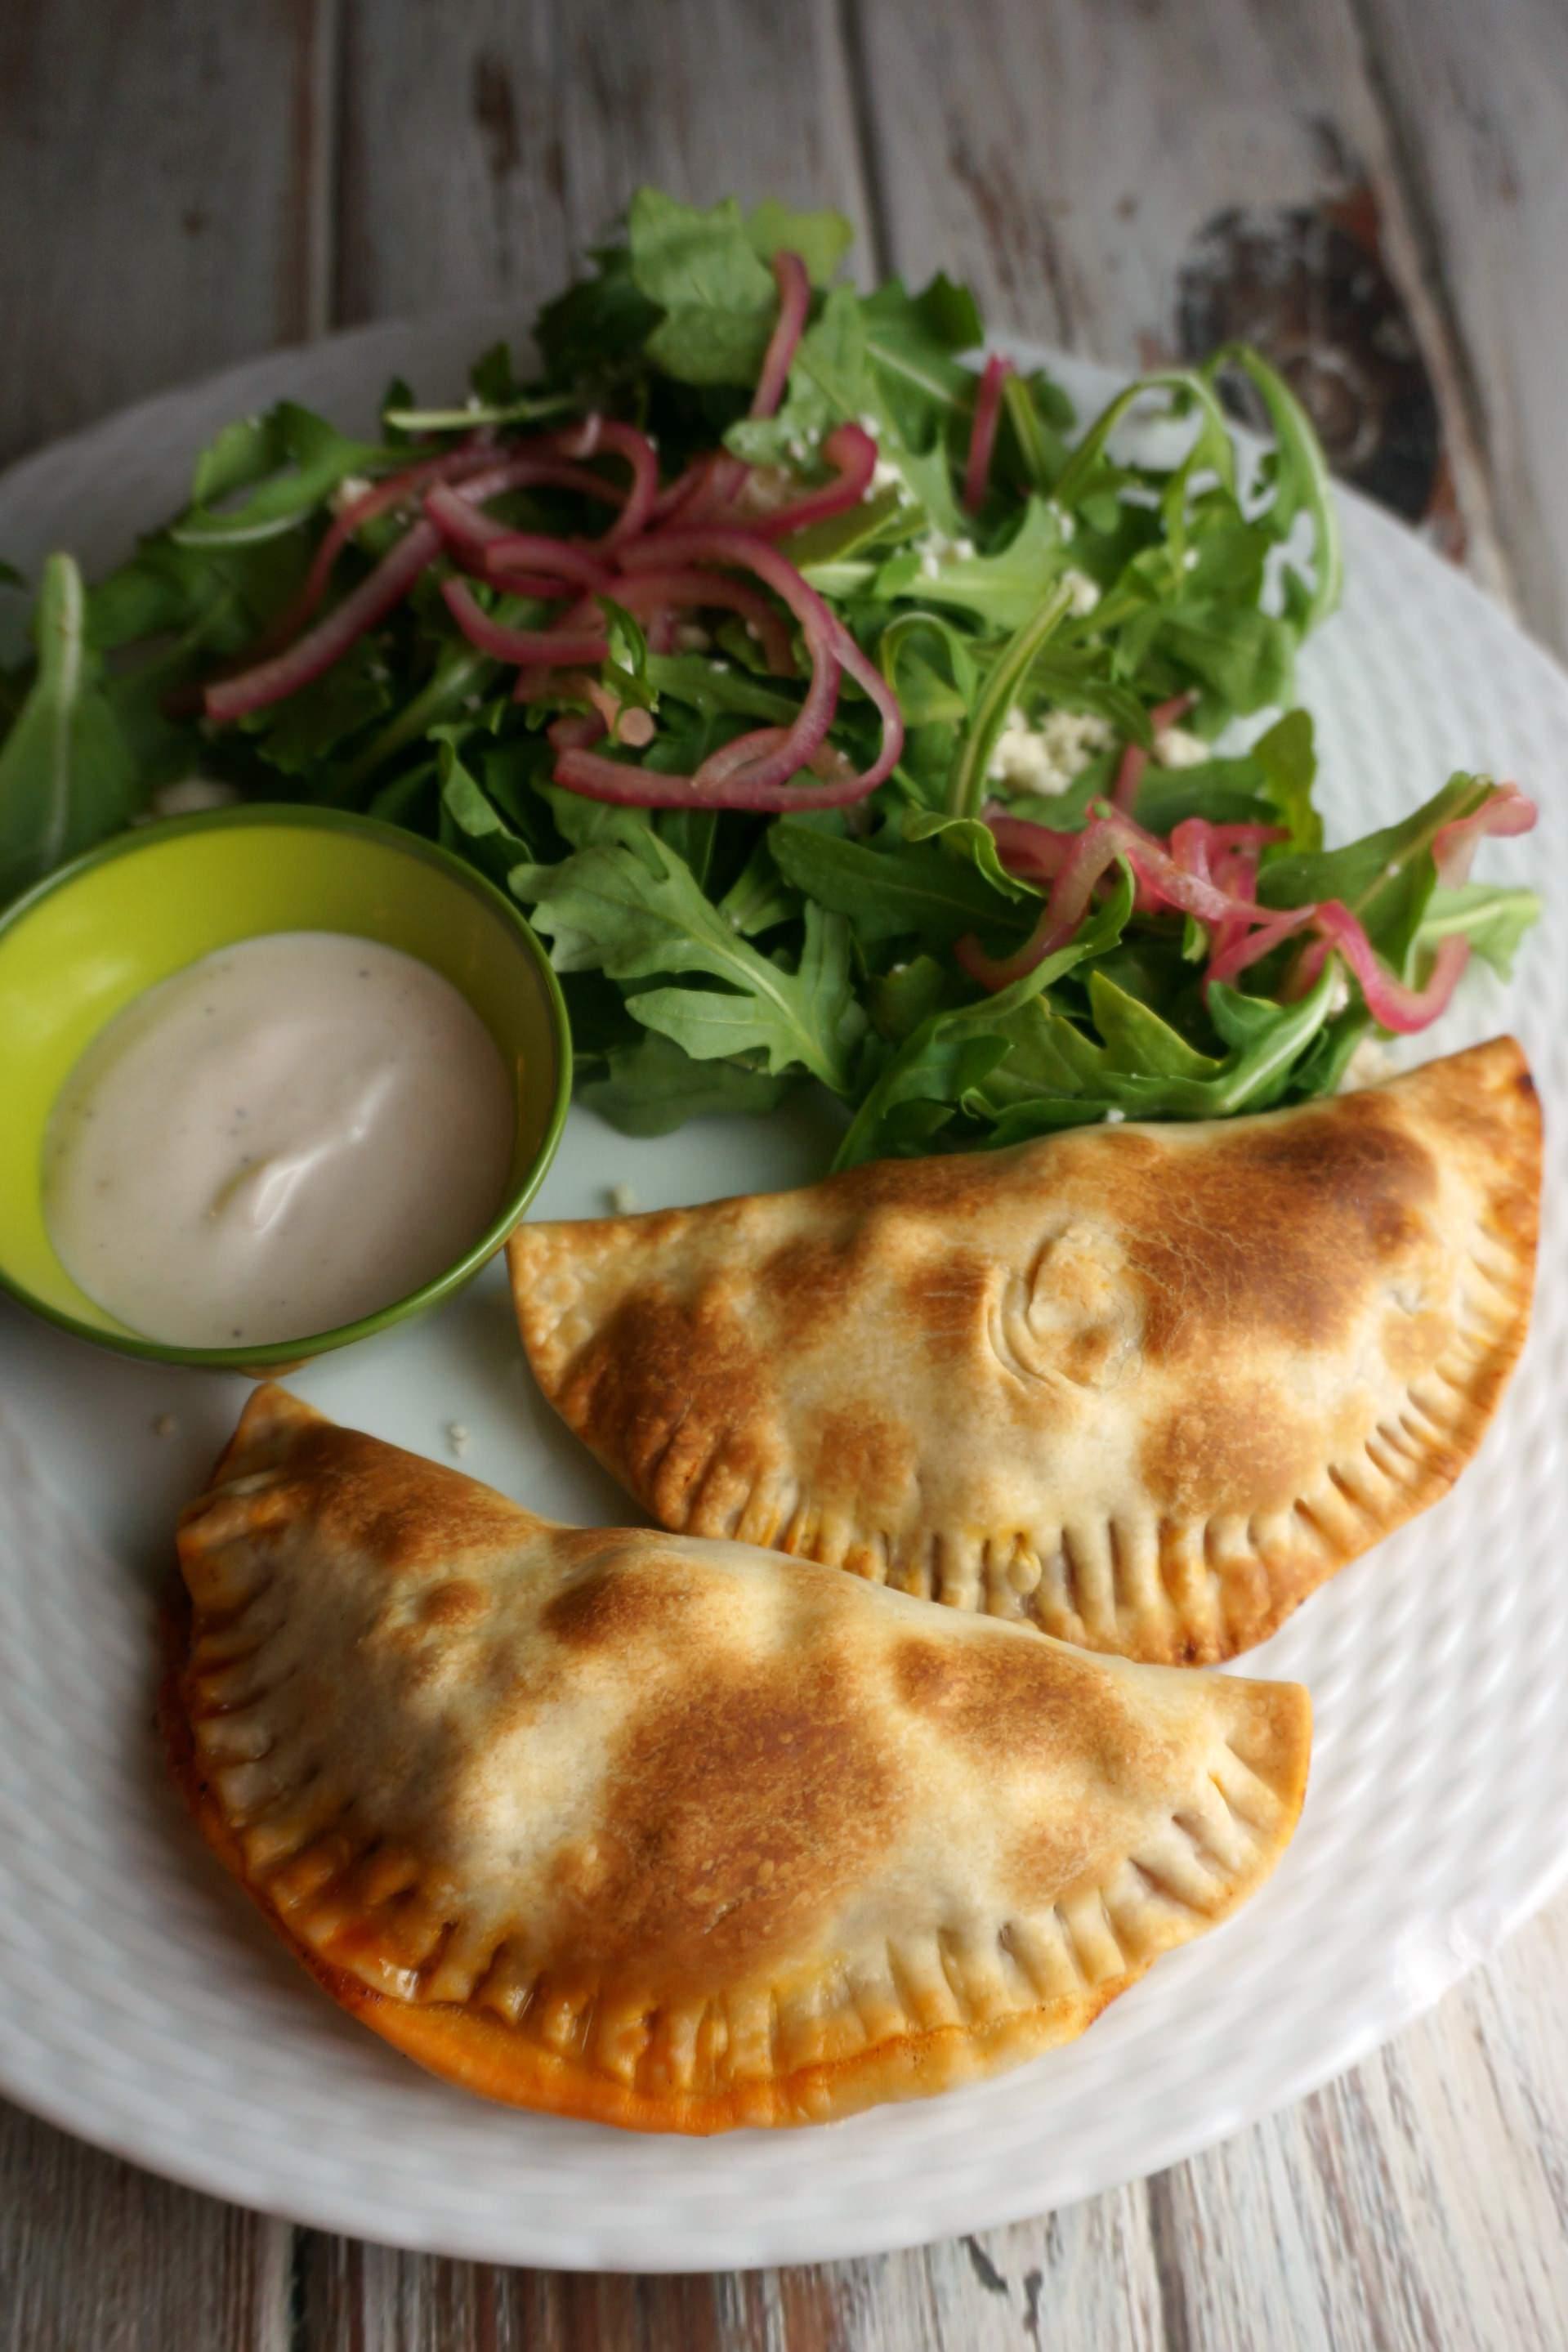 Blue apron omaha - Blue Apron Baked Empanadas